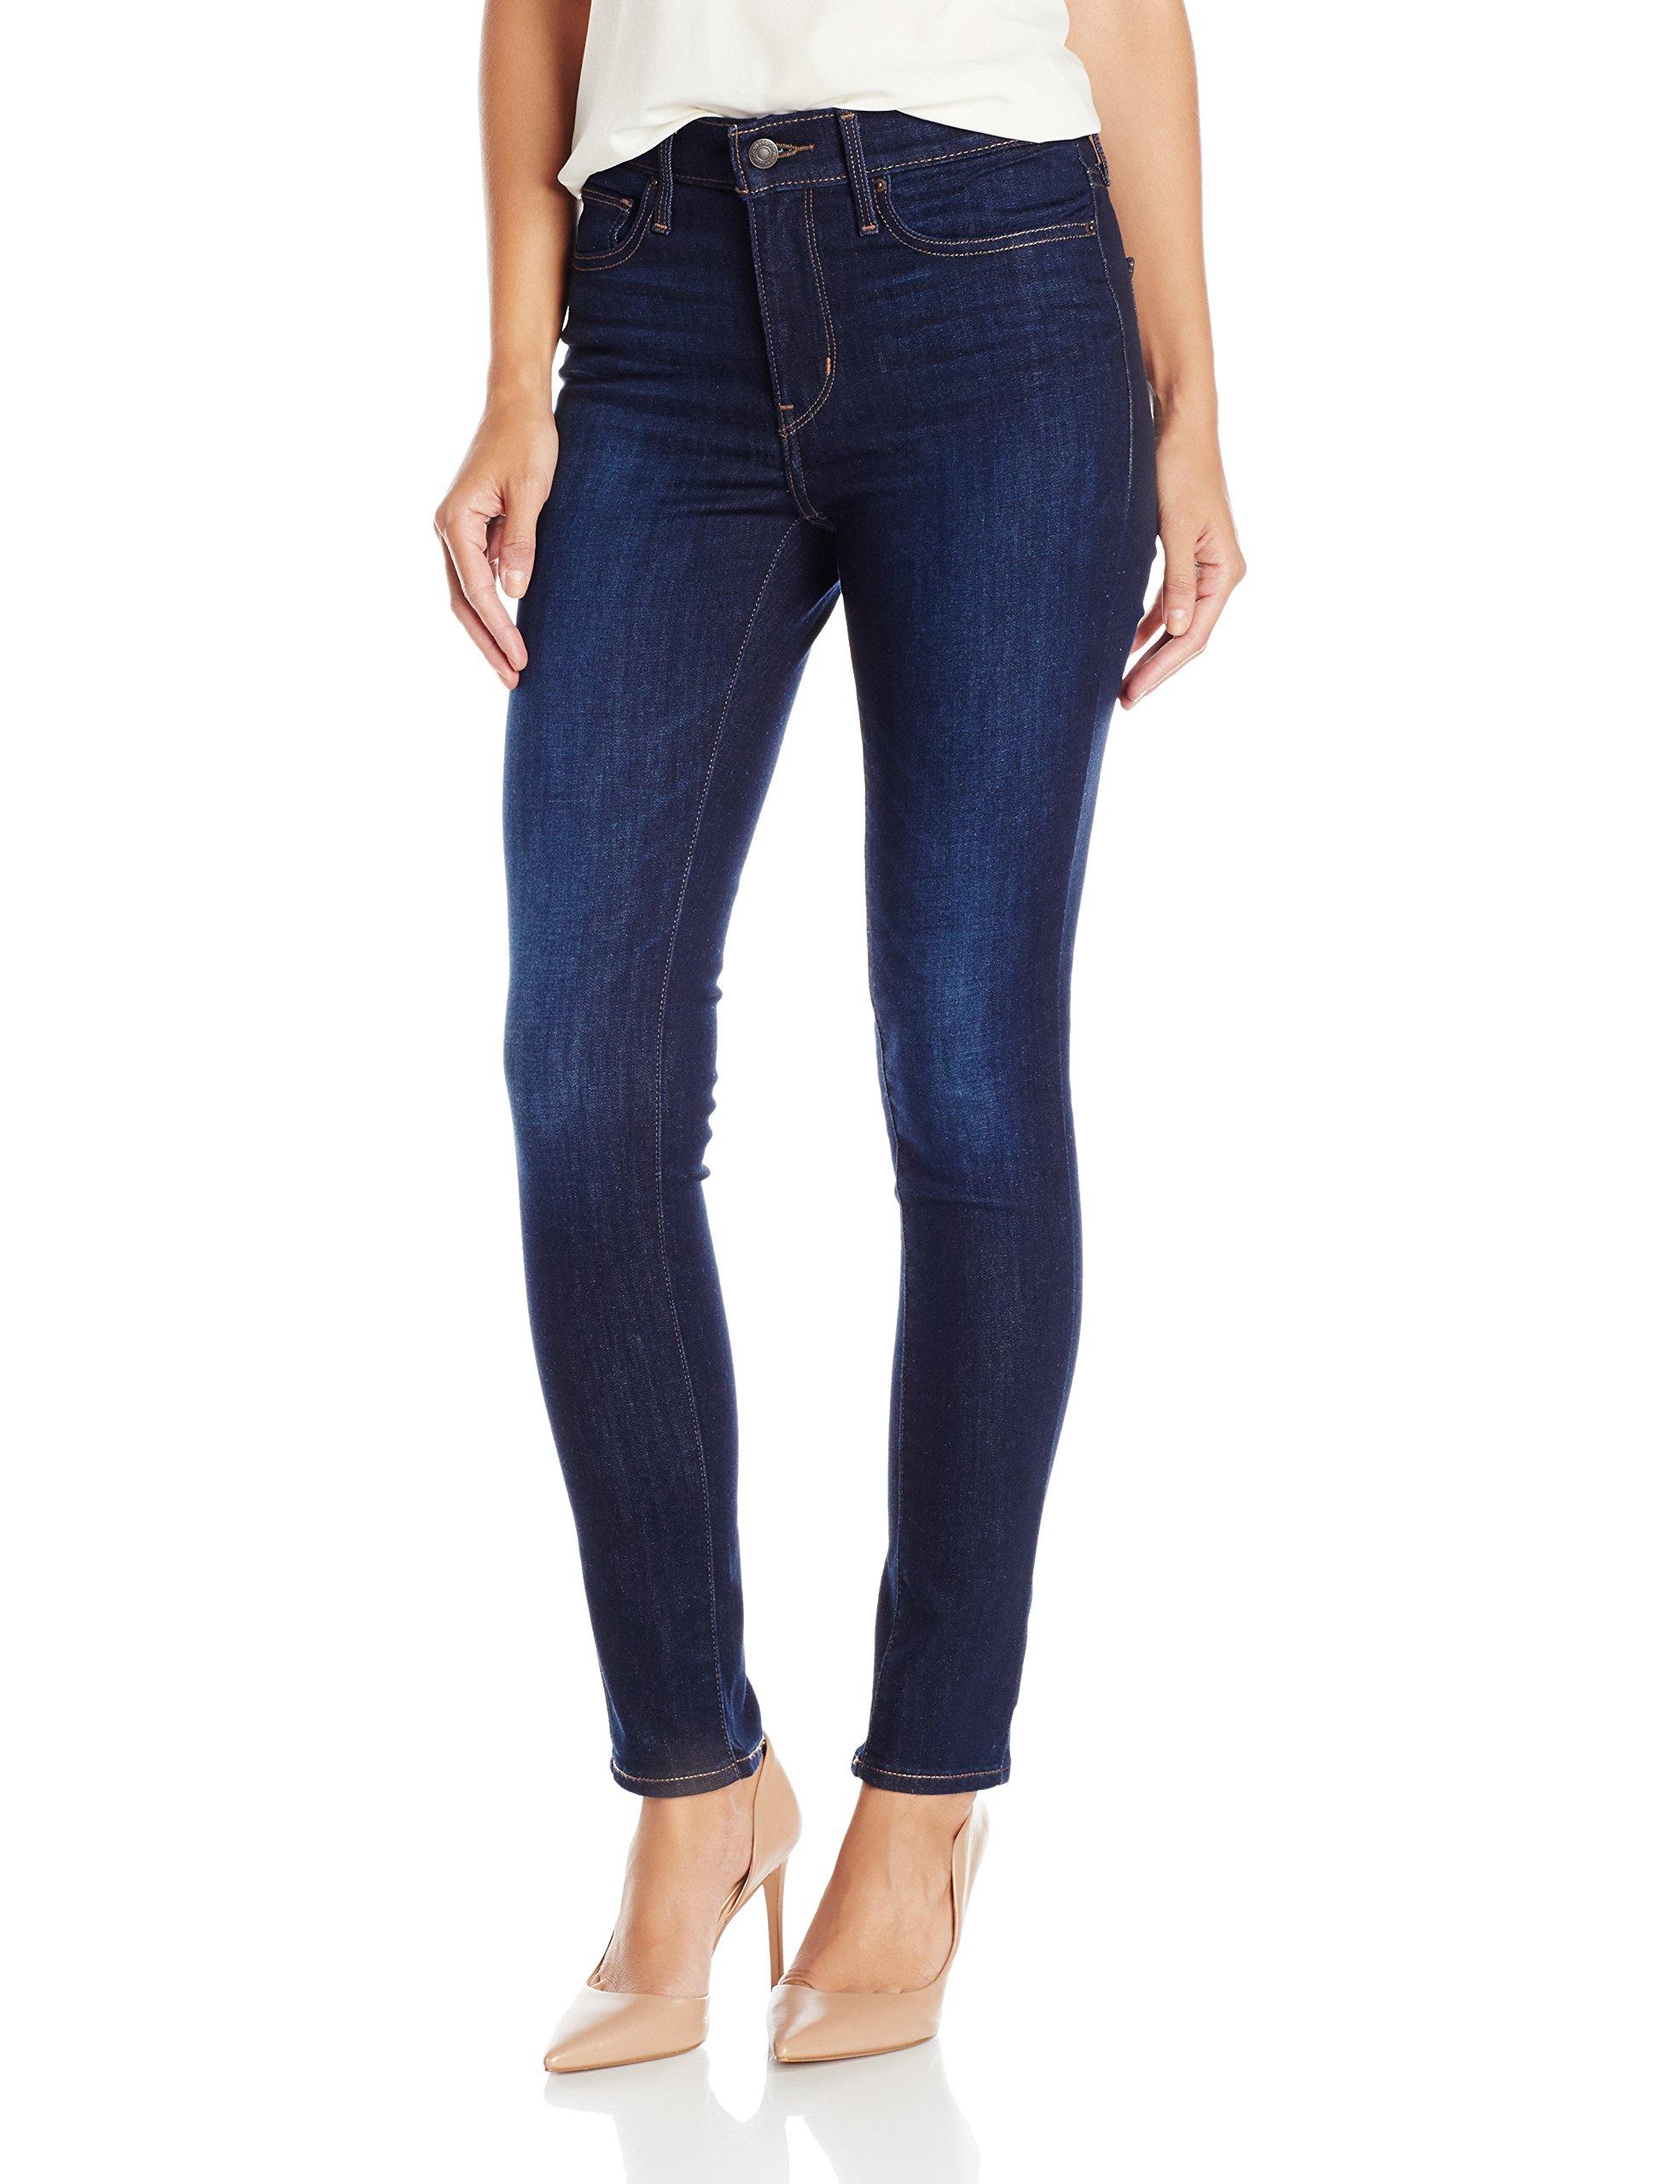 Levi's Women's Slimming Skinny Jean, Underwater Canyon (89% Cotton, 9% Polyester, 2% Elastane), 31Wx30L